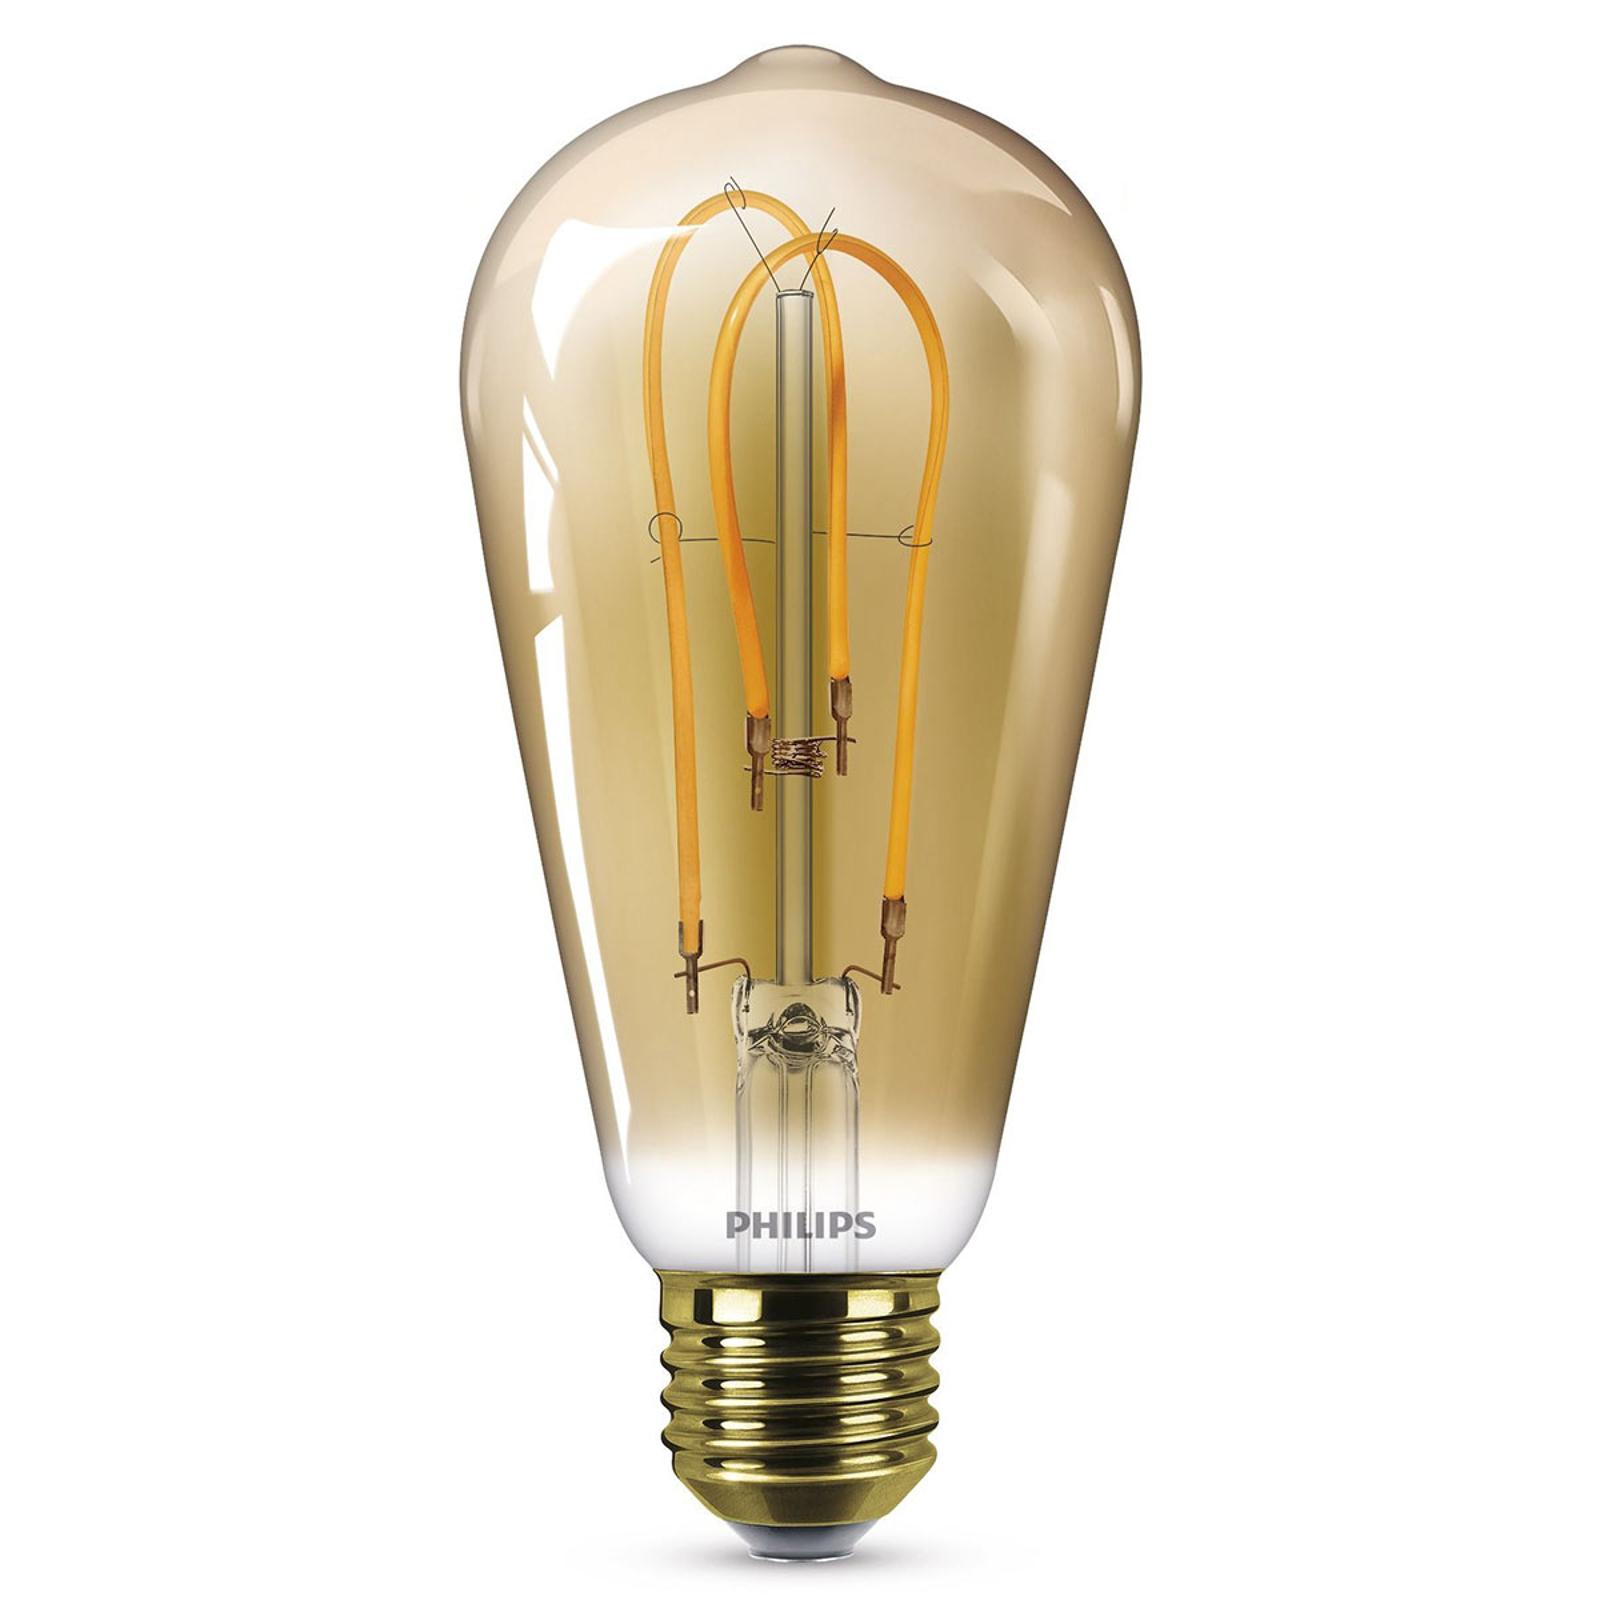 Philips E27 ST64 żarówka LED Curved 4W 2500K